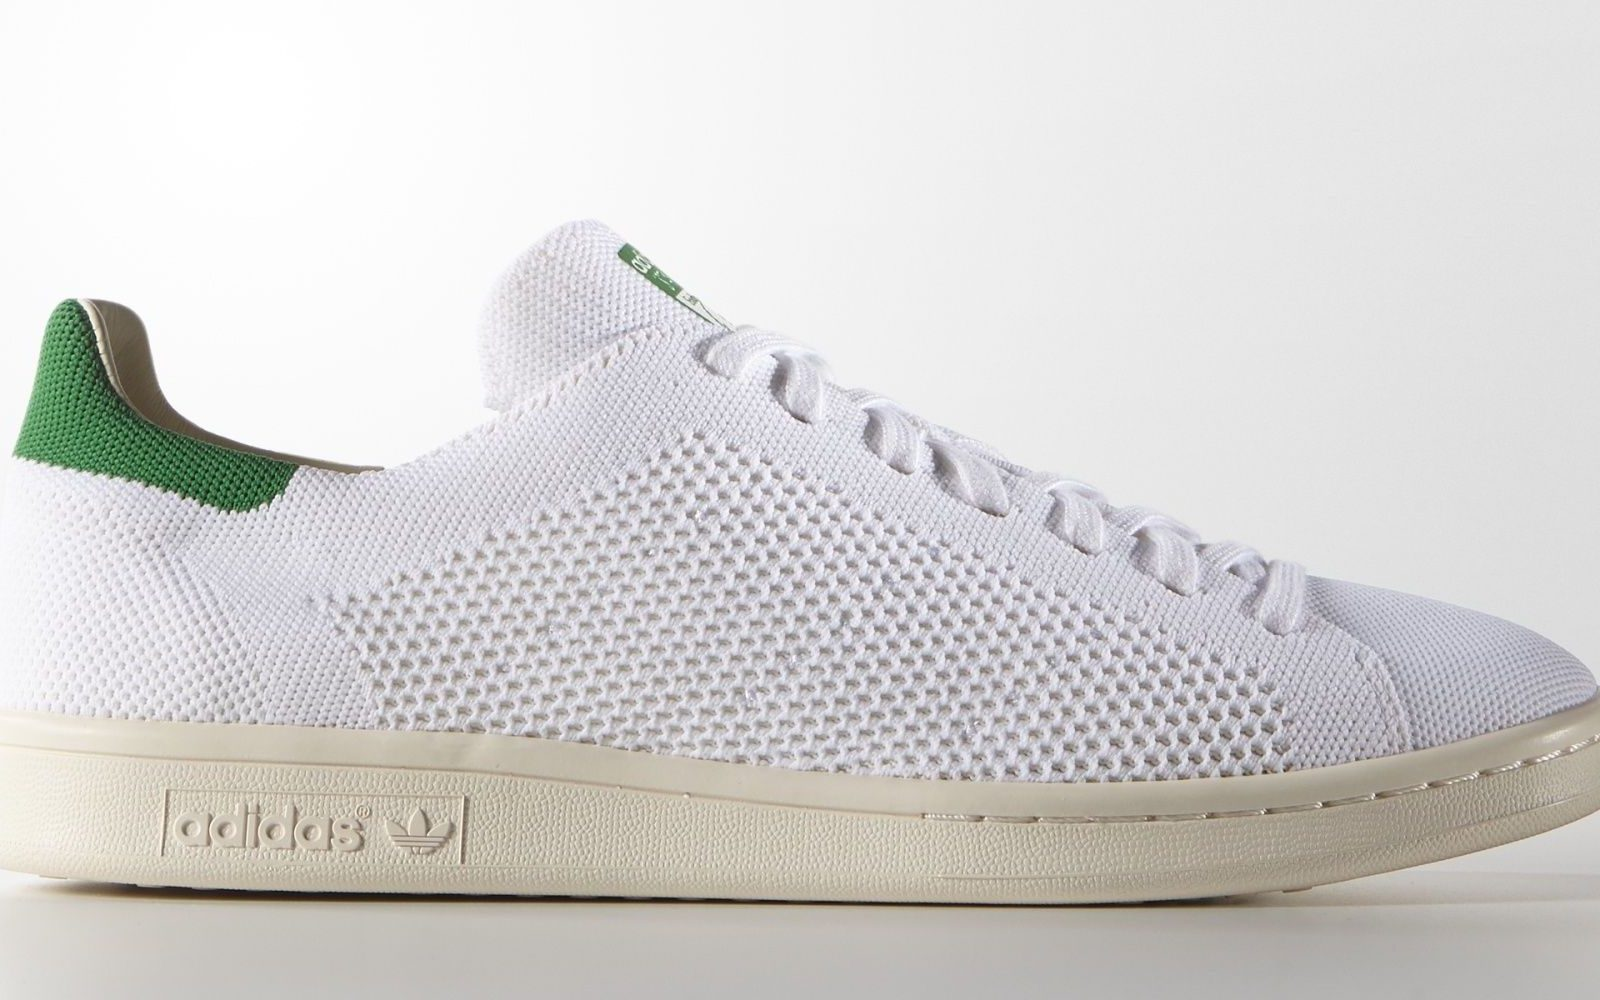 514f22f6714 Stan Smith adidas Men s Original Primeknit Shoes for  55 shipped ...